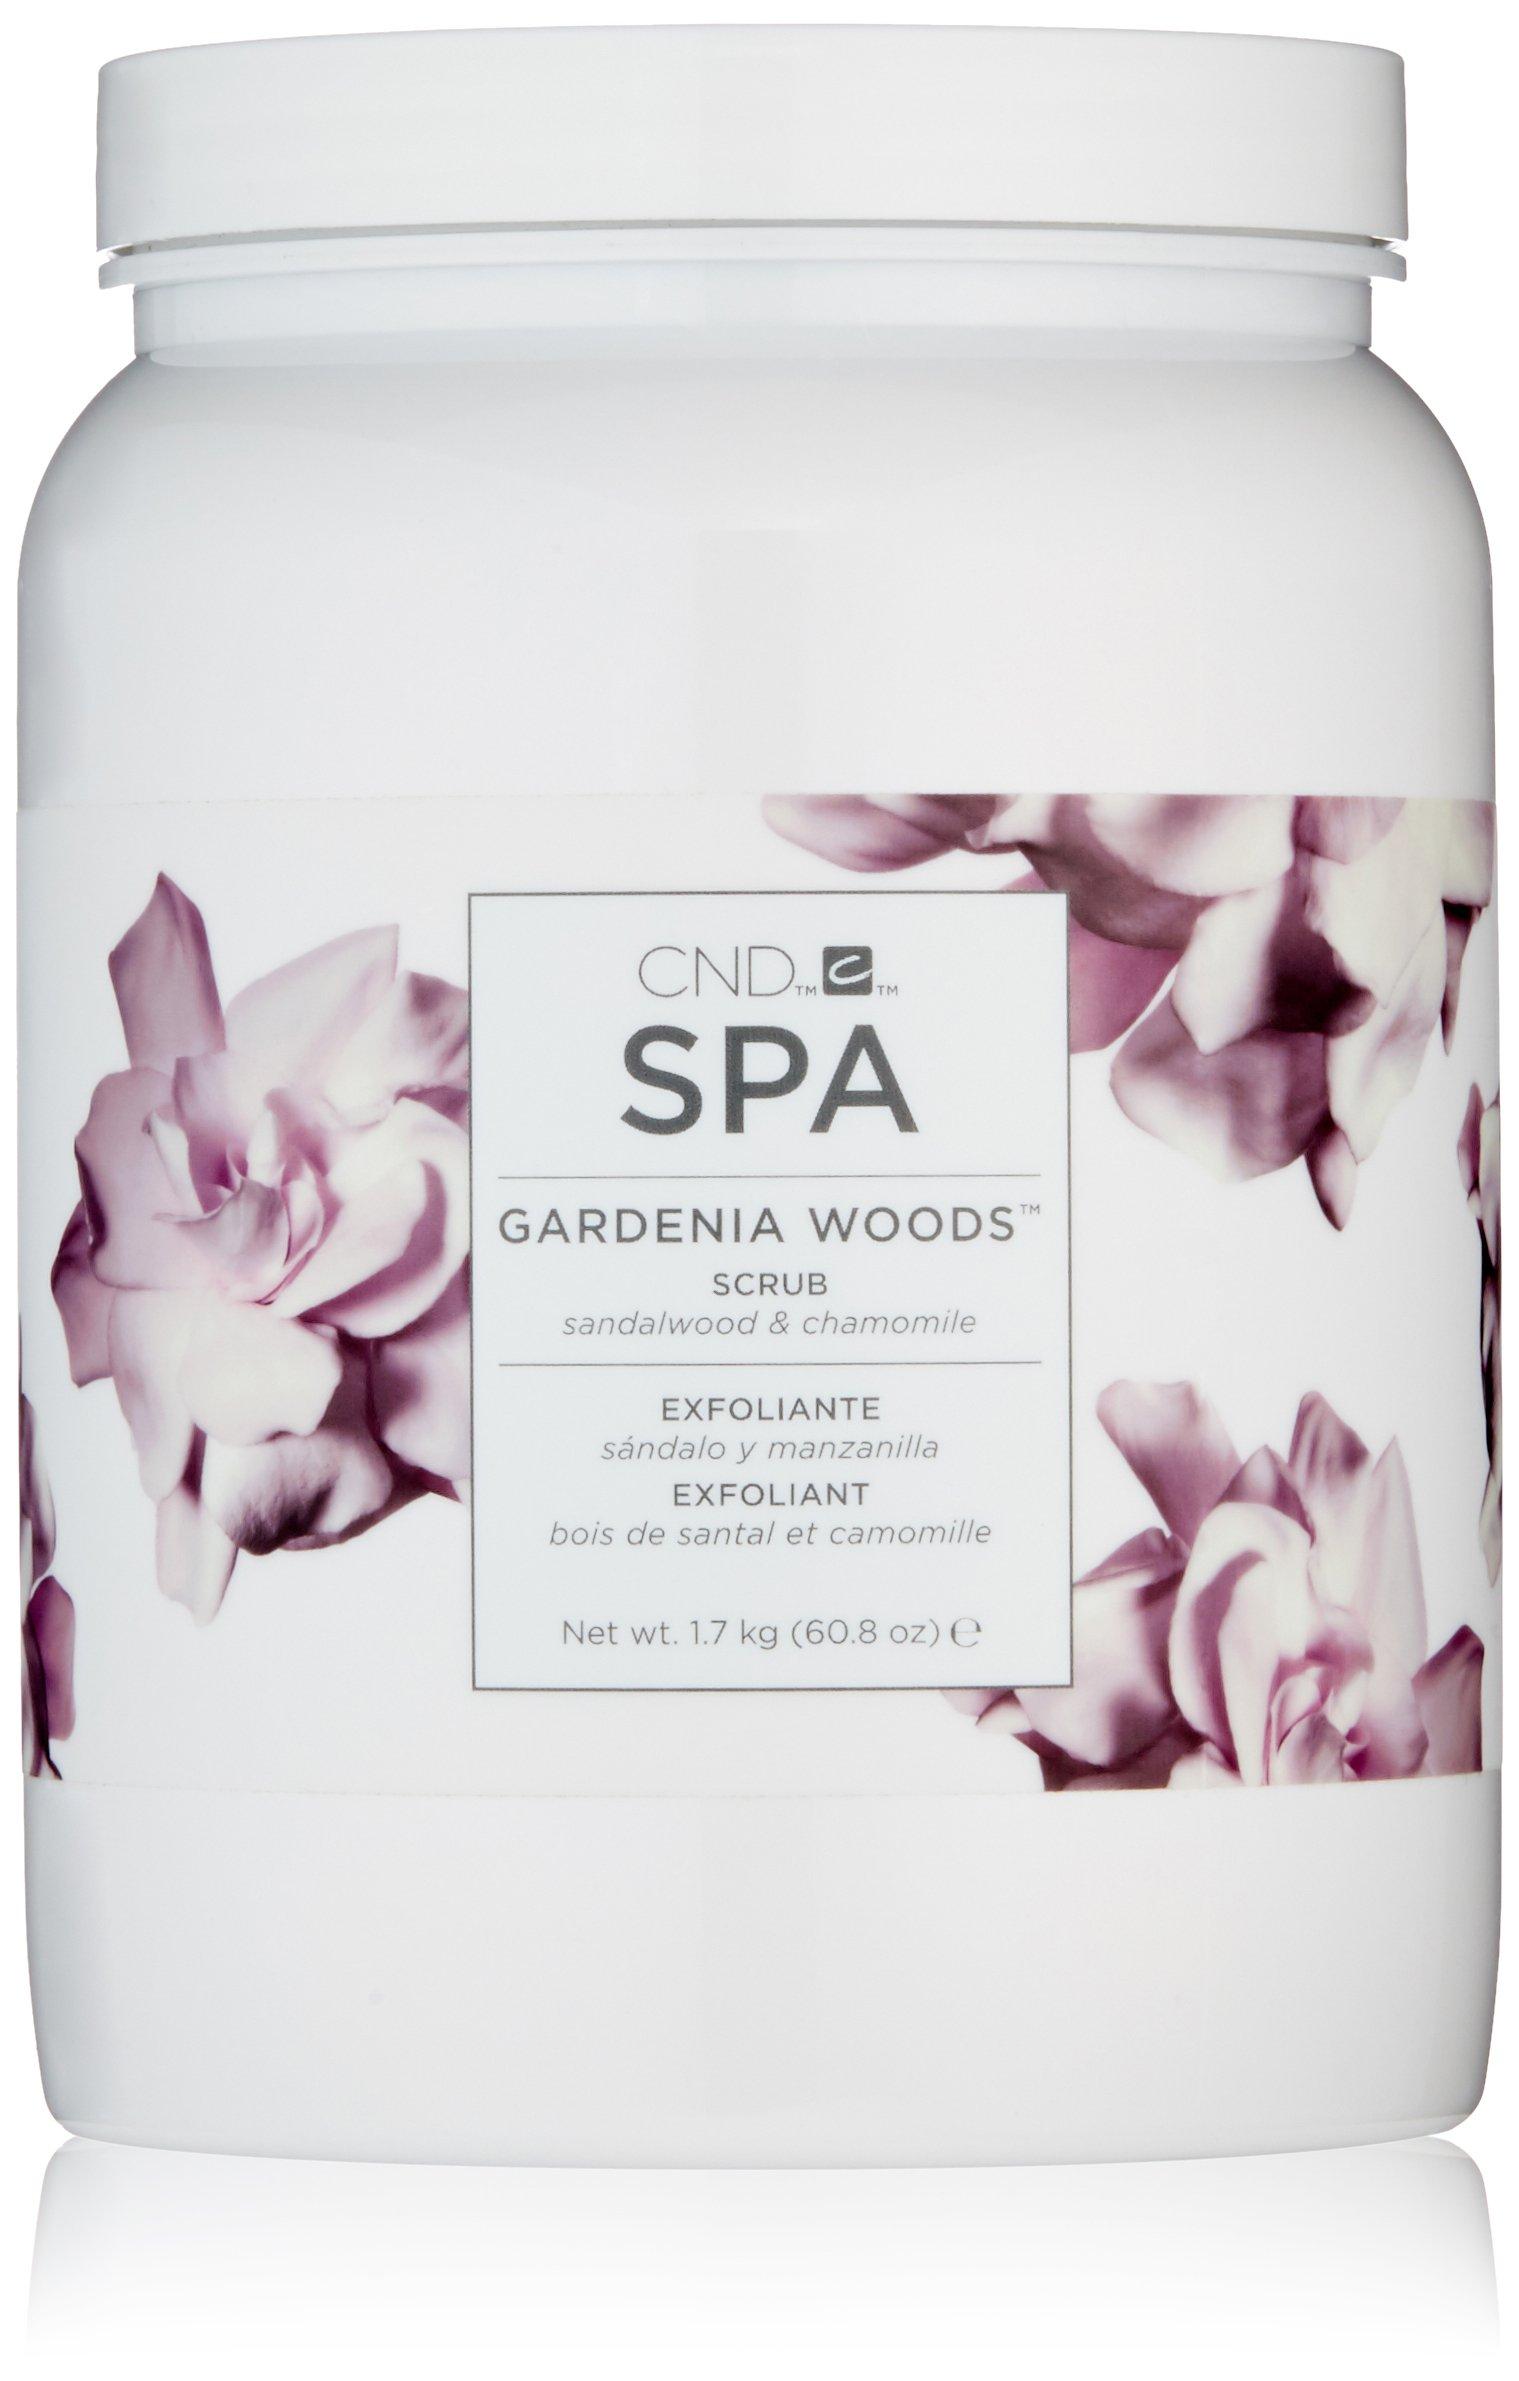 CND Gardenia Woods Scrub, 60.8 fl. oz.